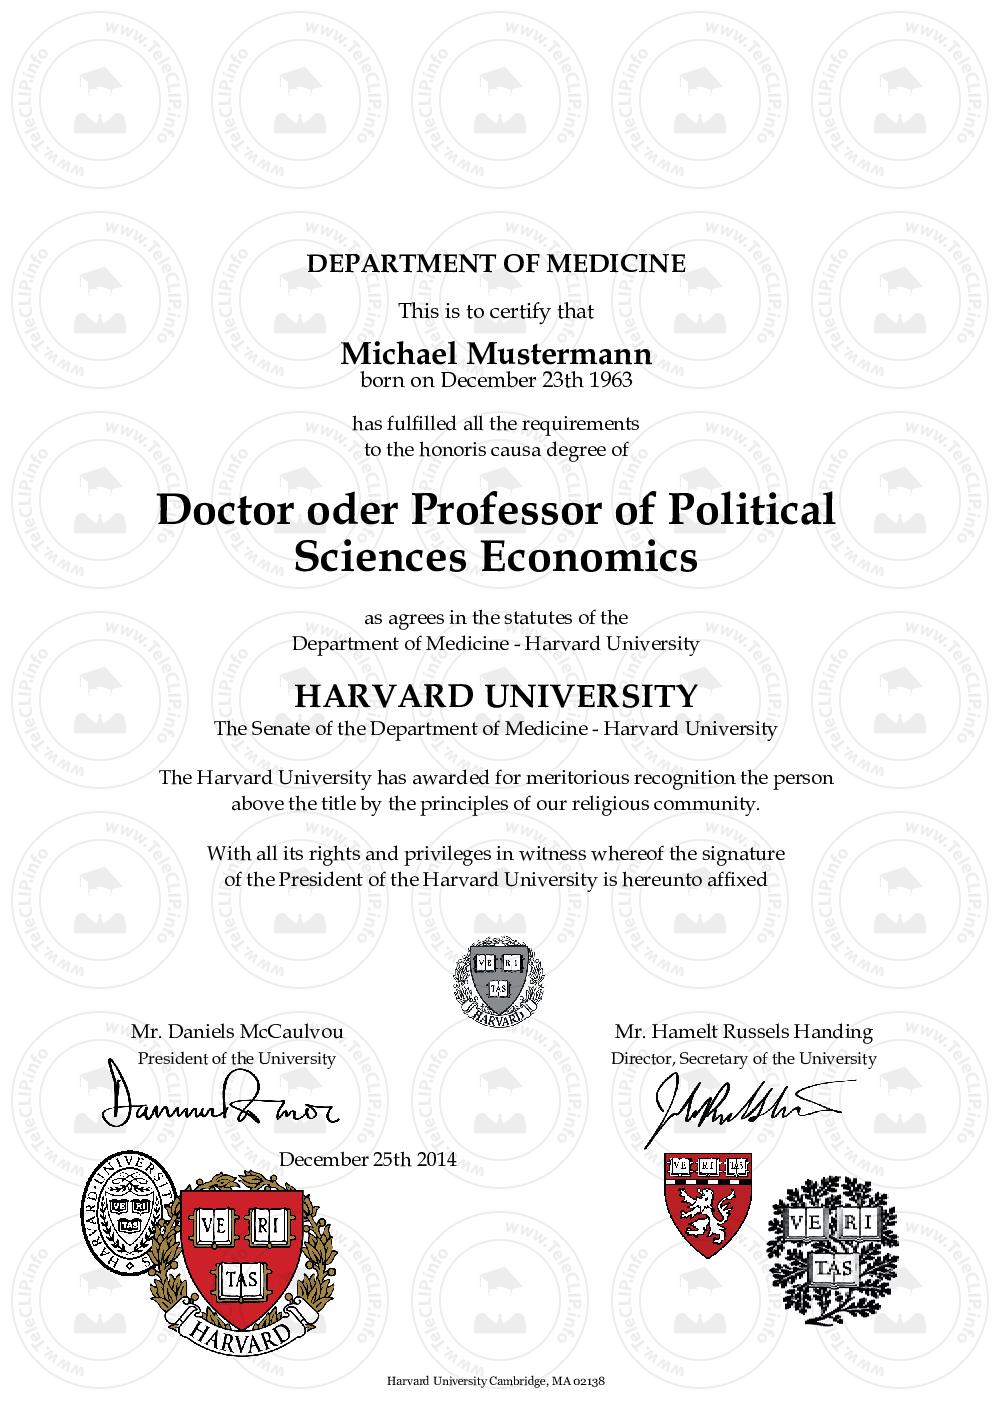 doktortitel-harvard_11